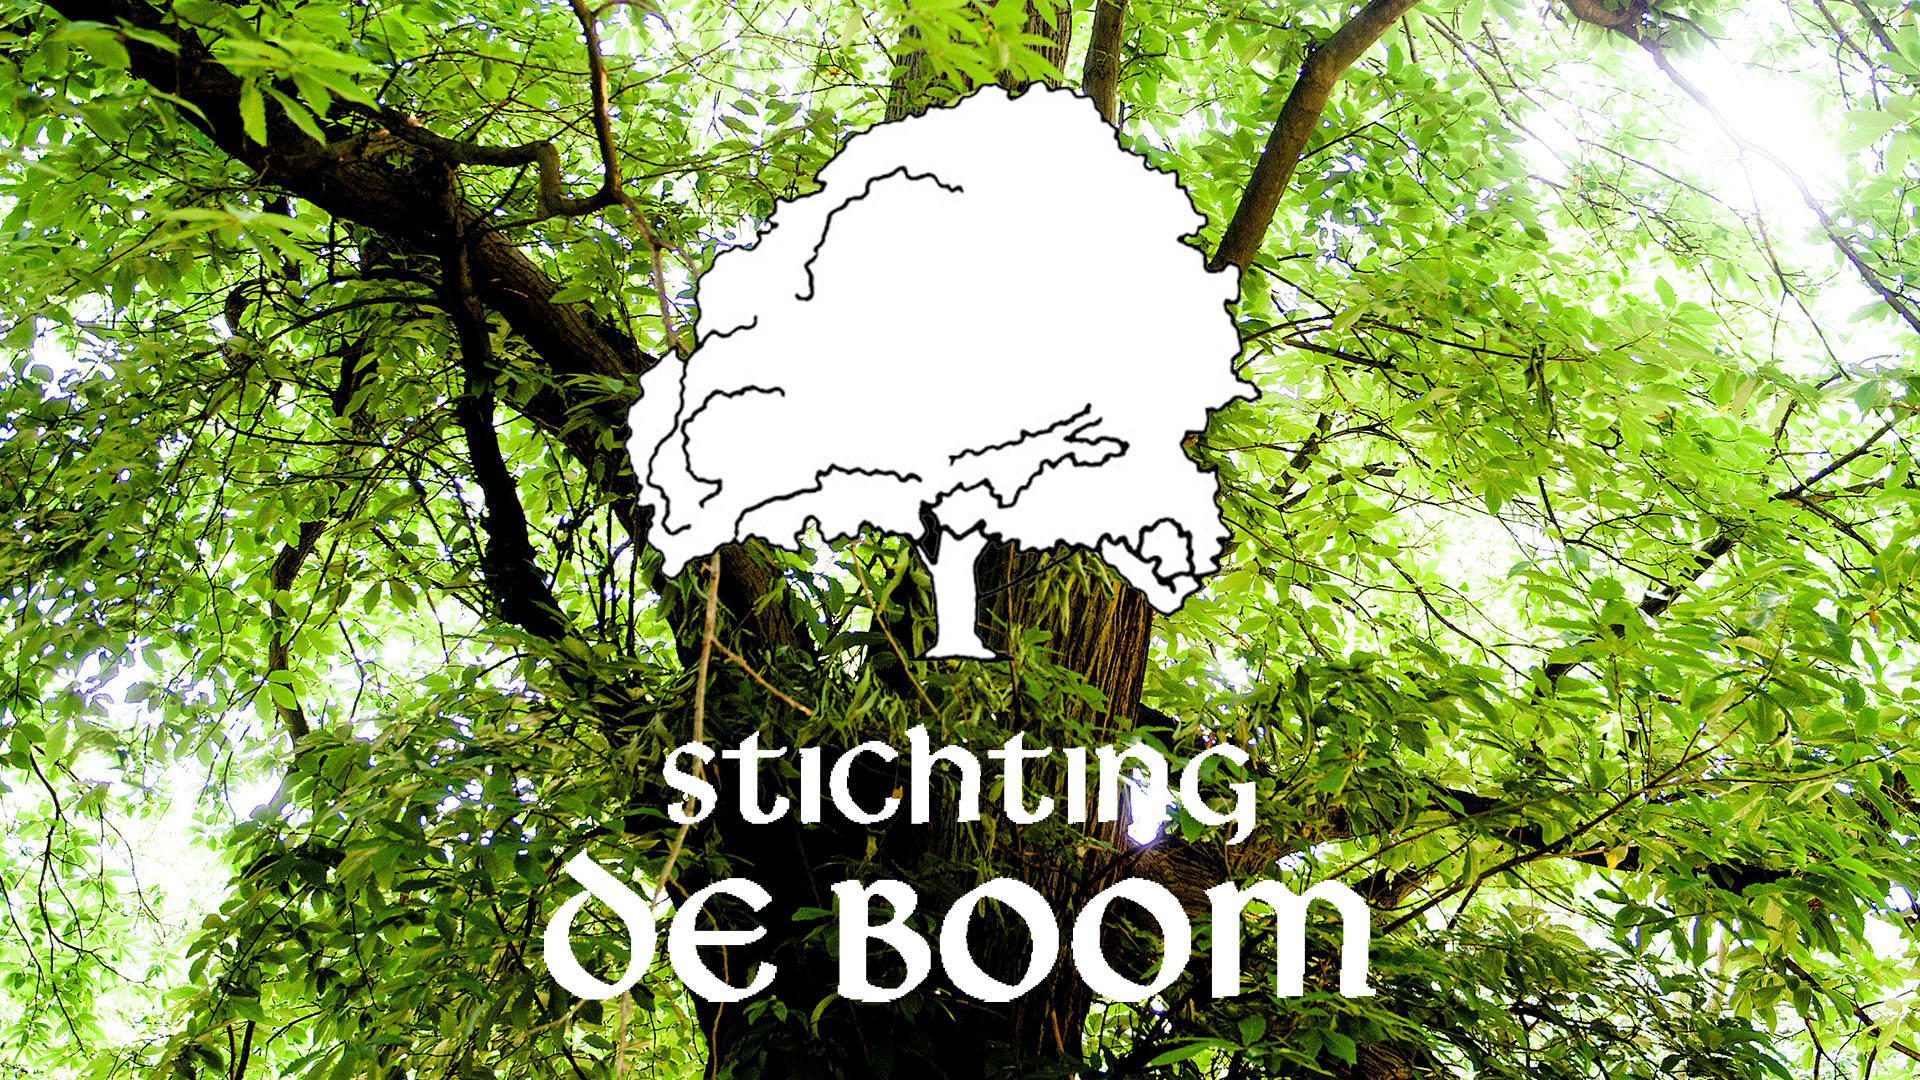 Stichting de Boom